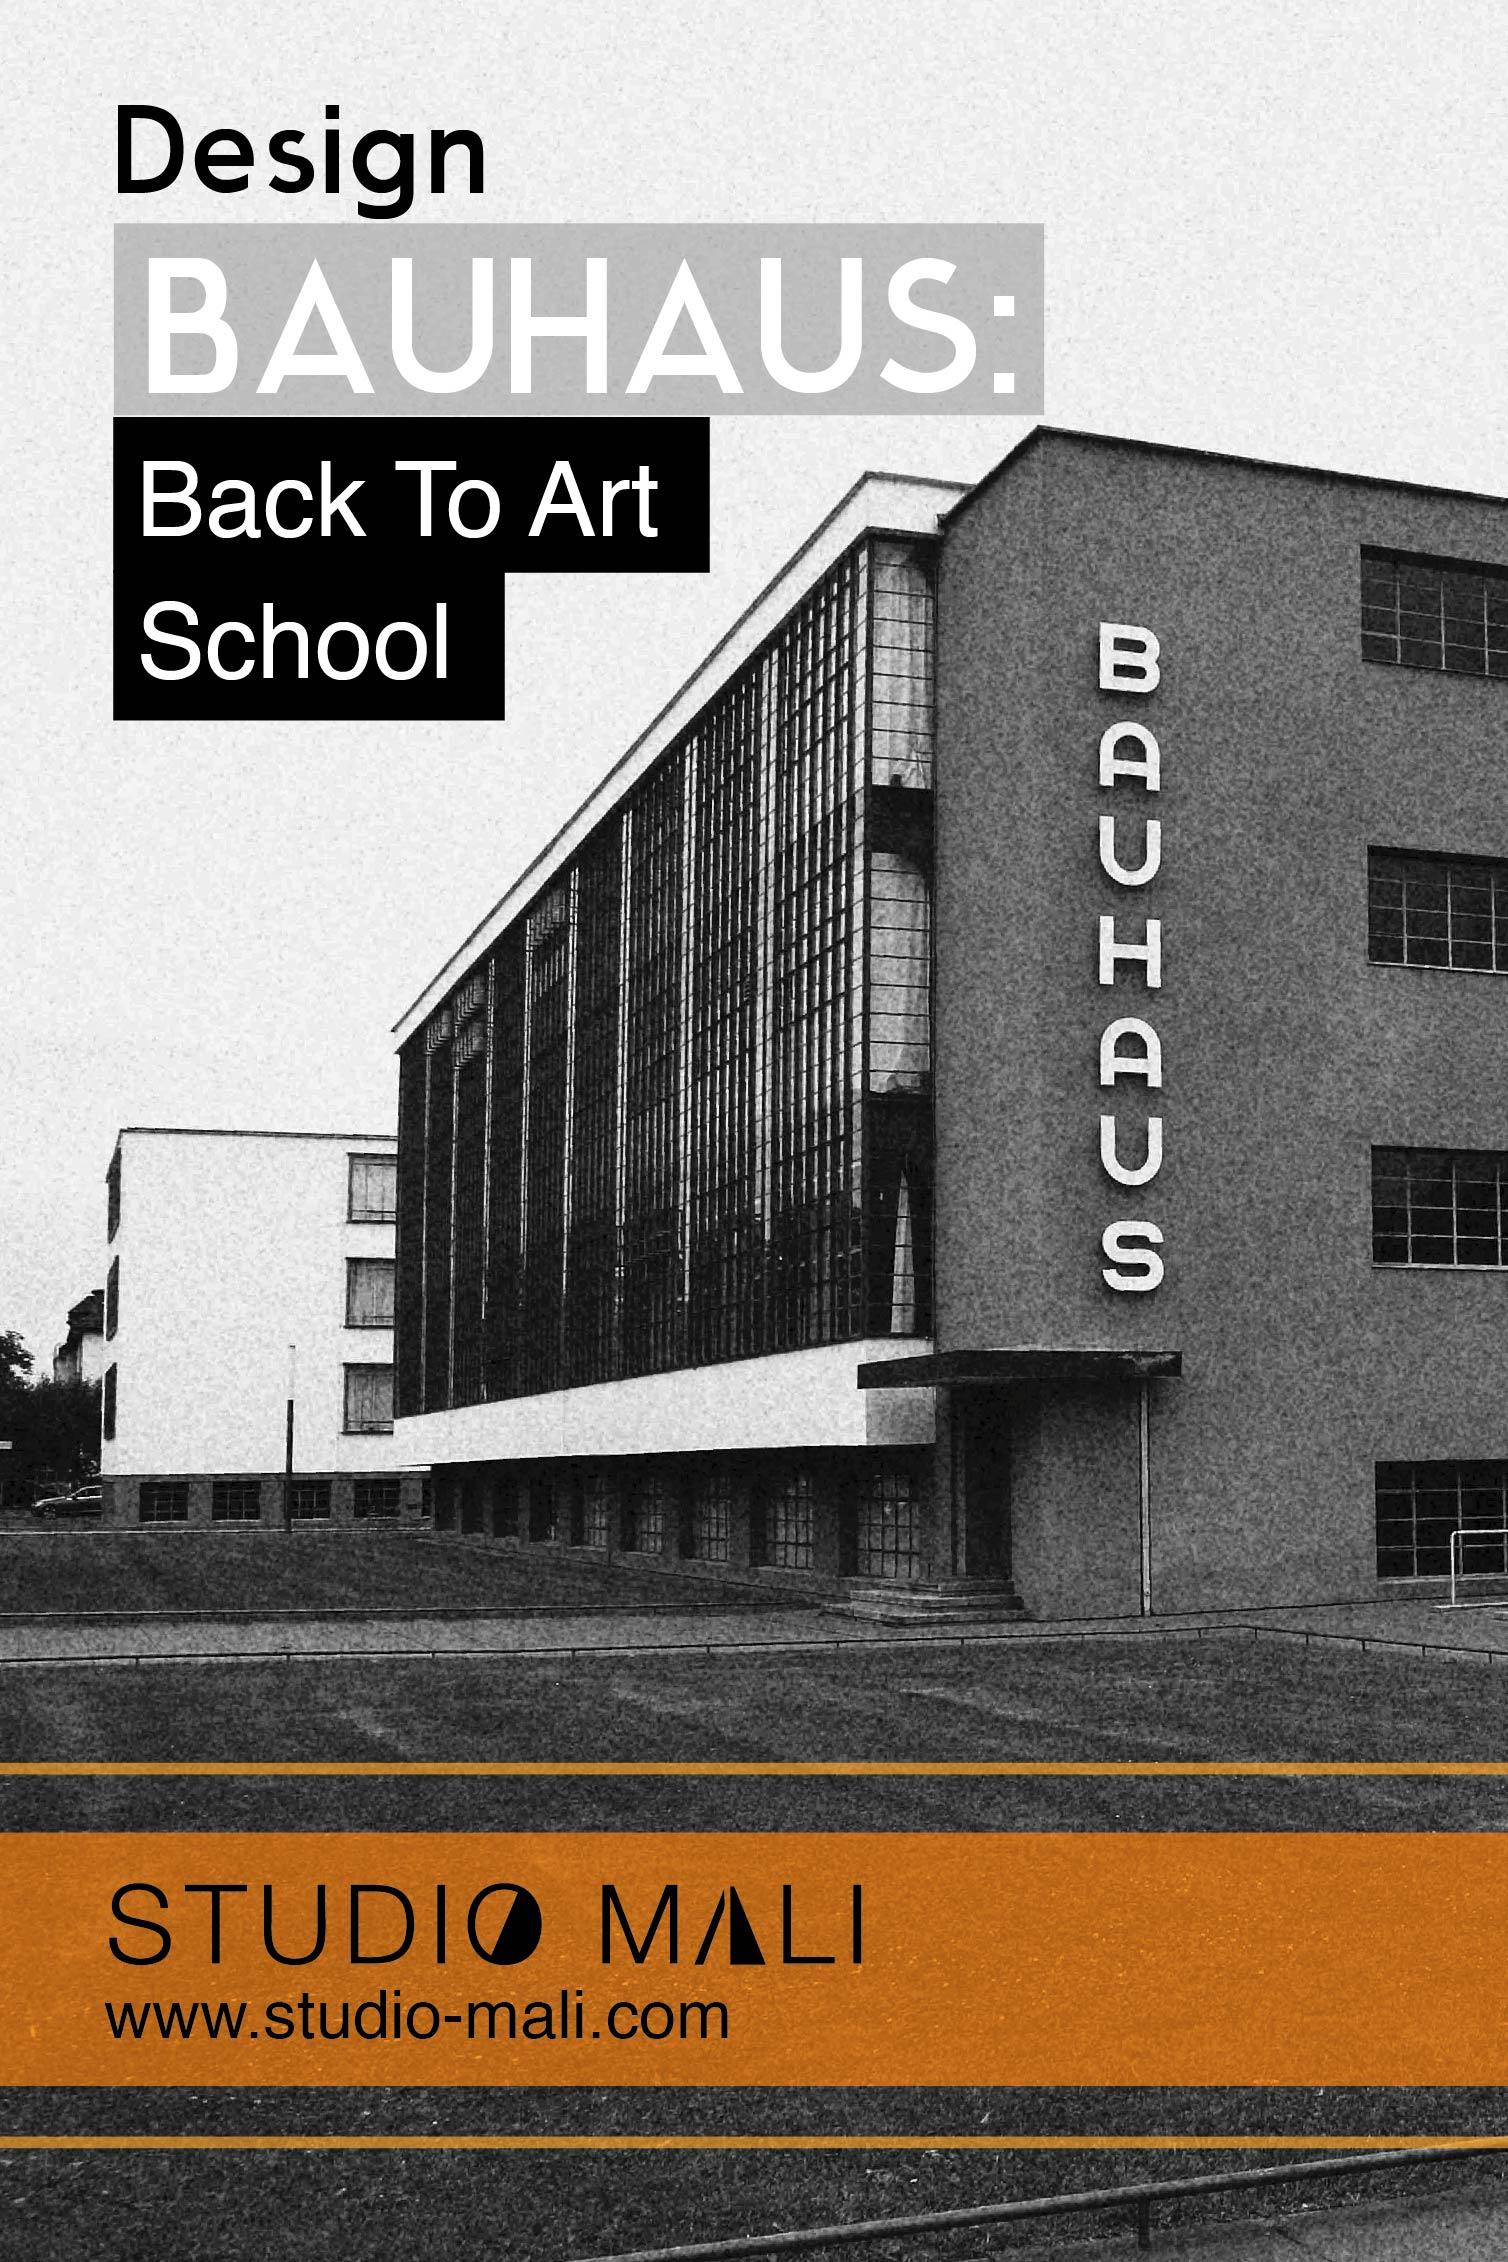 Bauhaus - Back To Art School, by Studio Mali